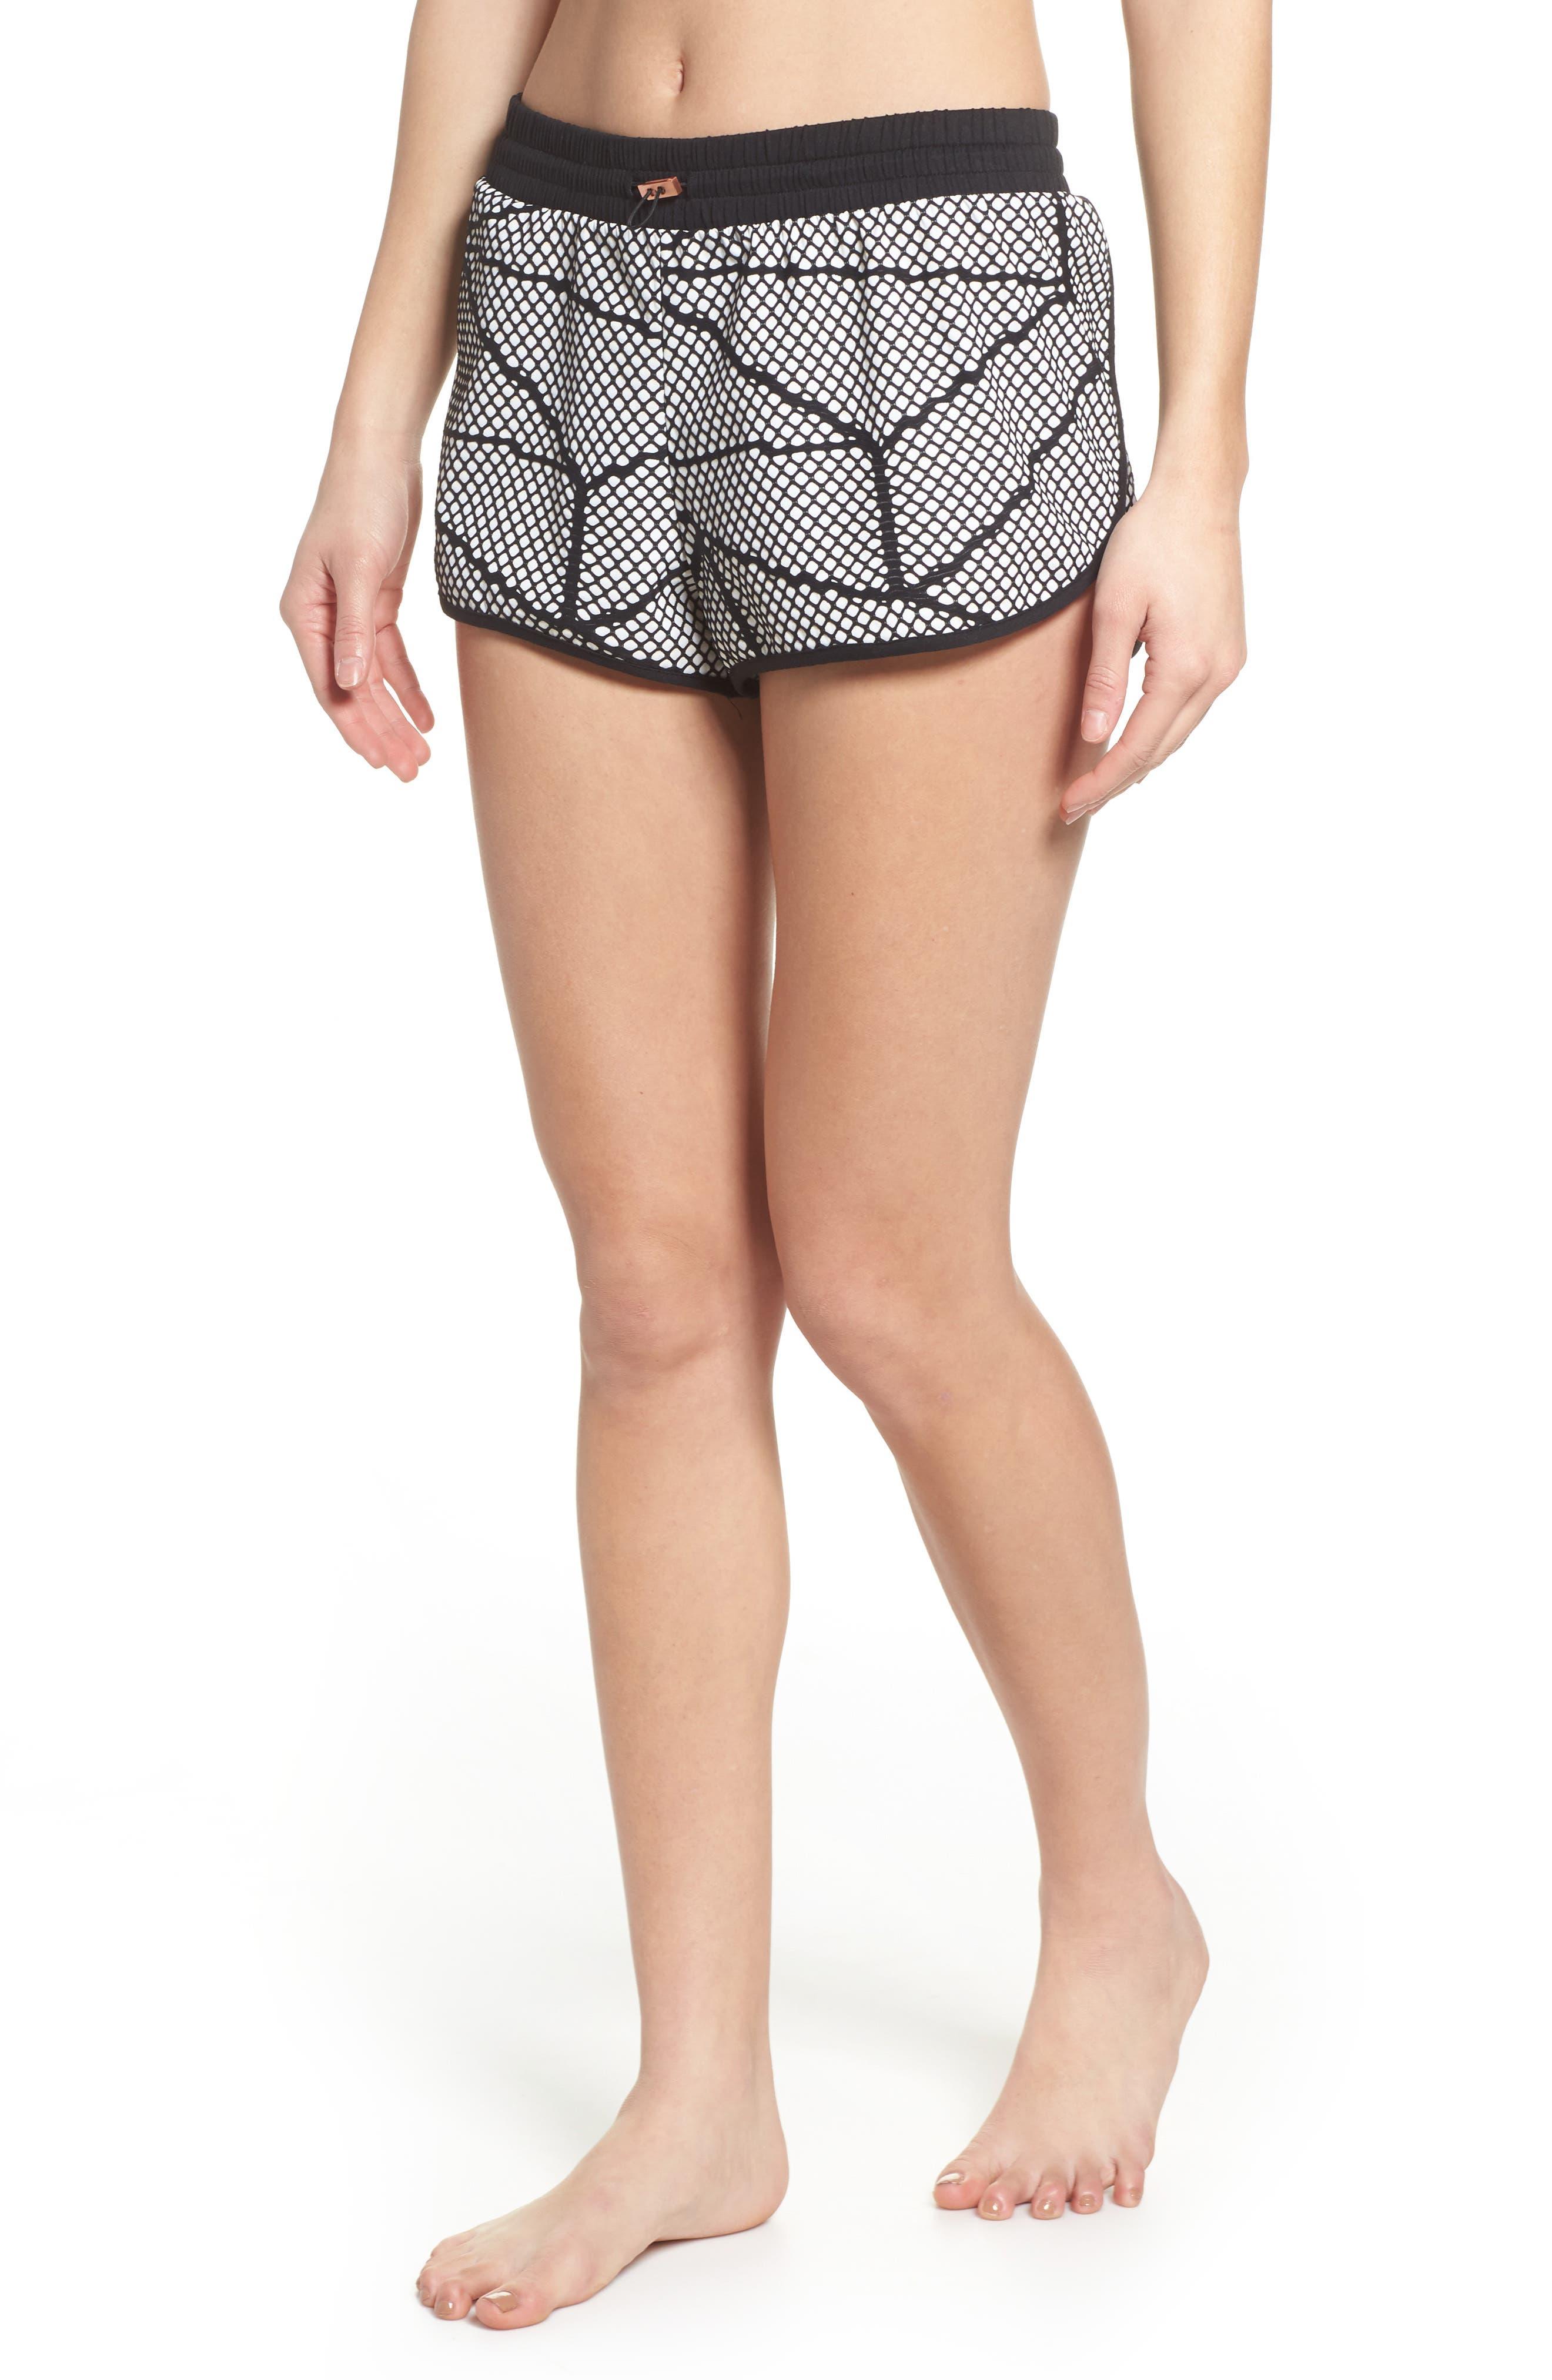 Chromatic Shorts,                         Main,                         color, Cr5048 Black-White Chromatic